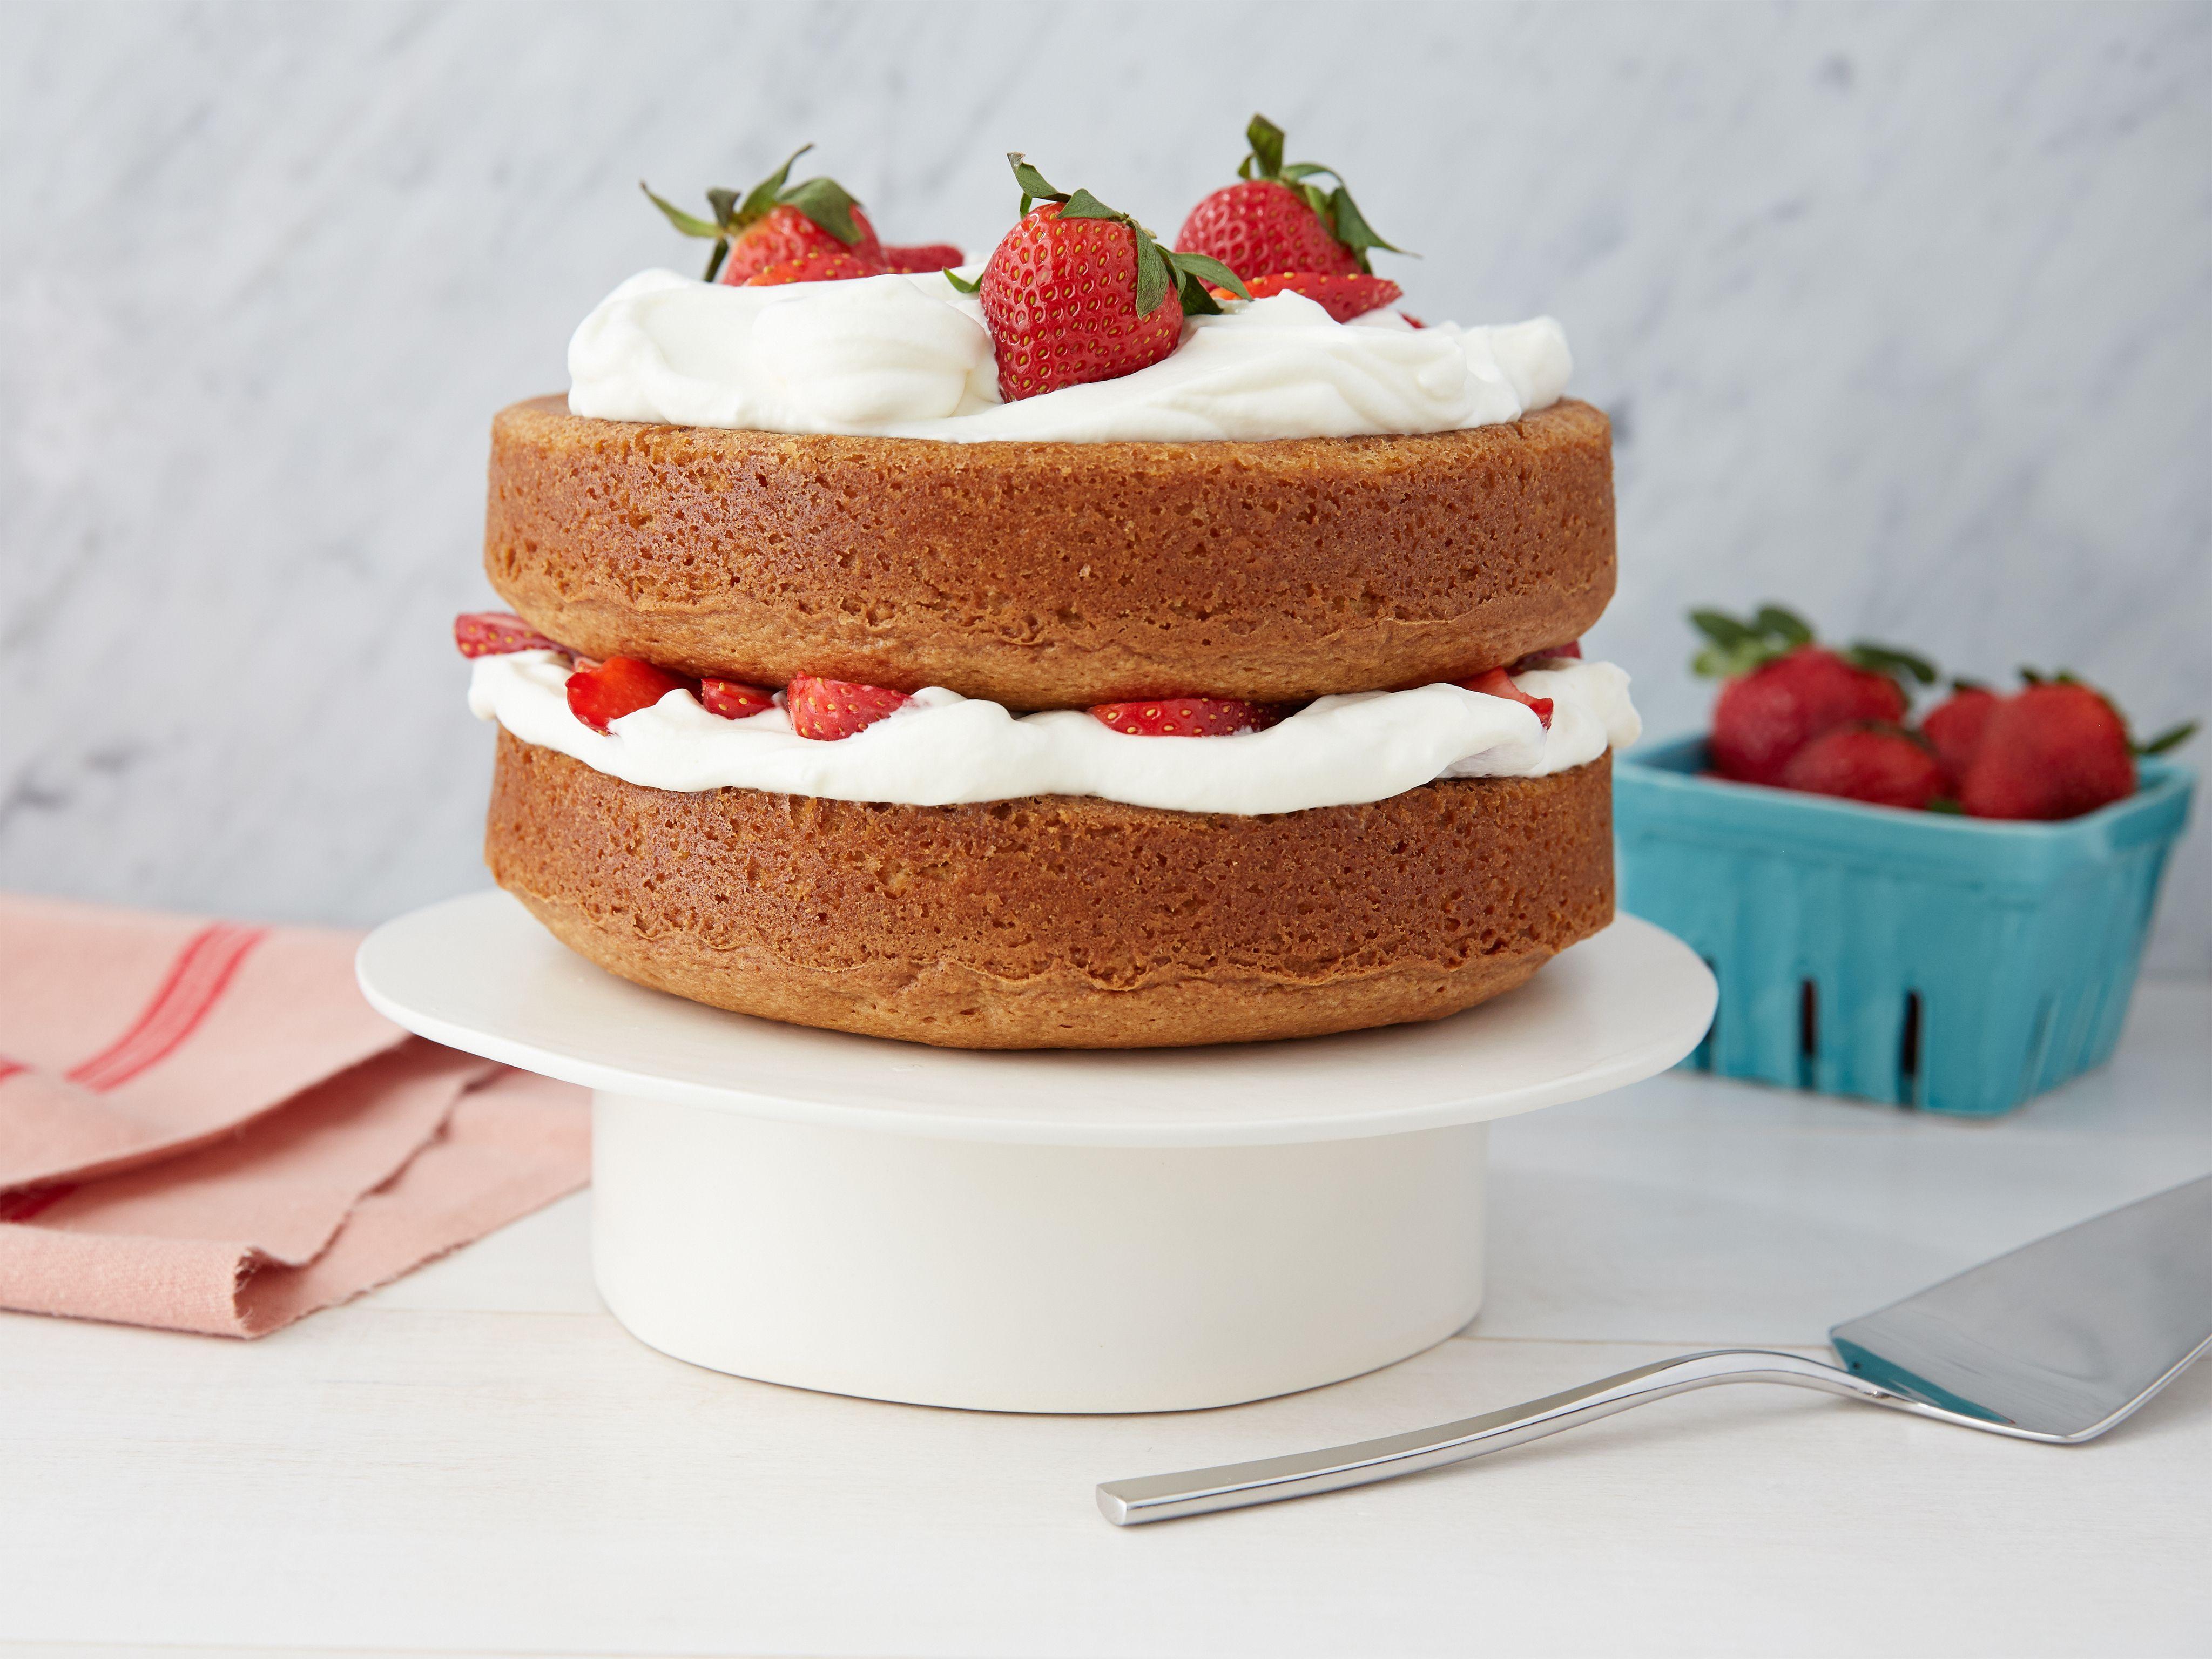 Strawberry country cake recipe ina garten garten and cake barefoot contessa strawberry country cake recipe ina garten food forumfinder Image collections